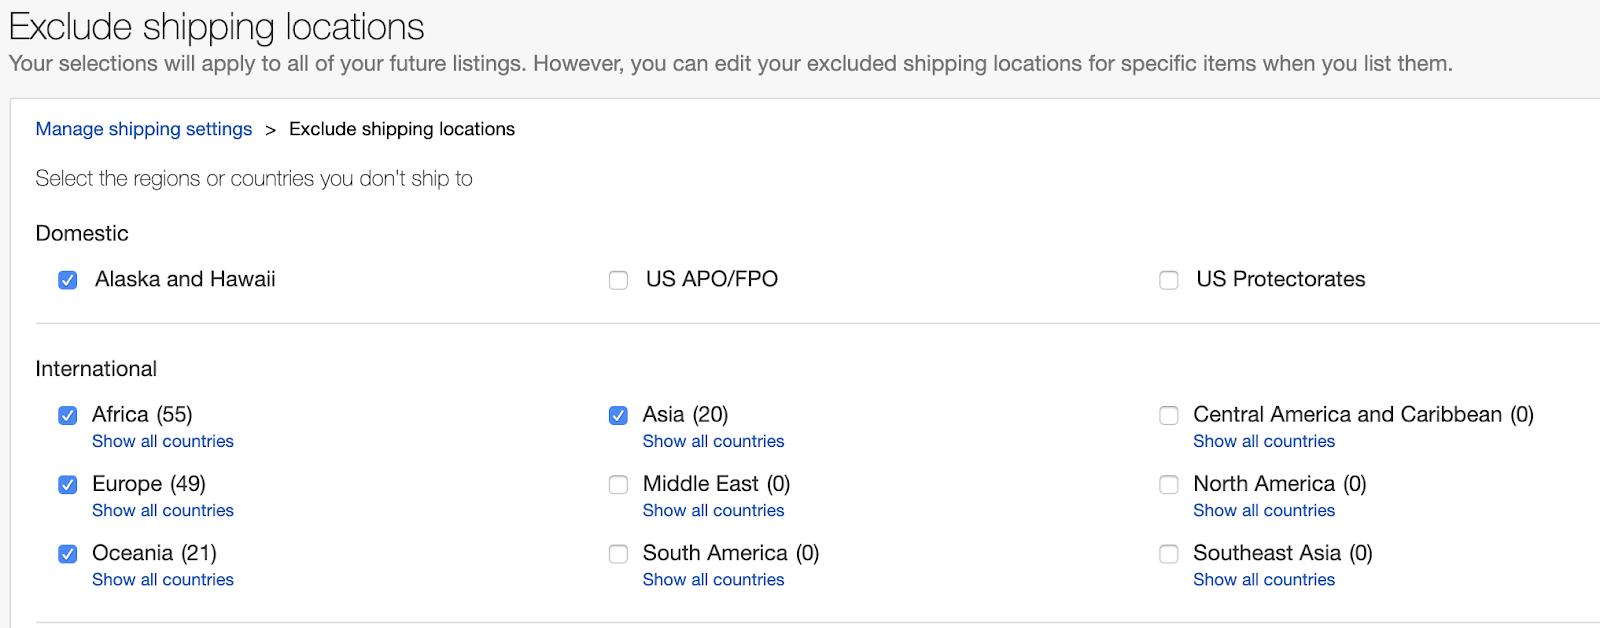 How To Block A Buyer On eBay - Zik Analytics